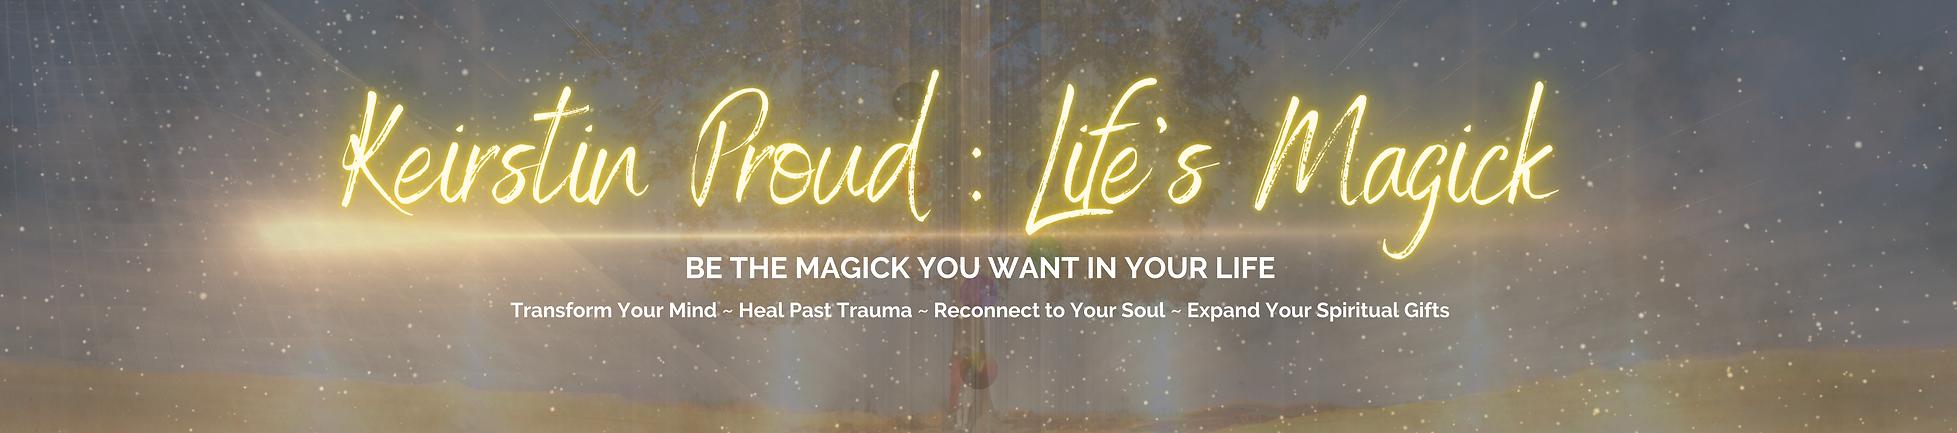 Website banner Life's Magick.png